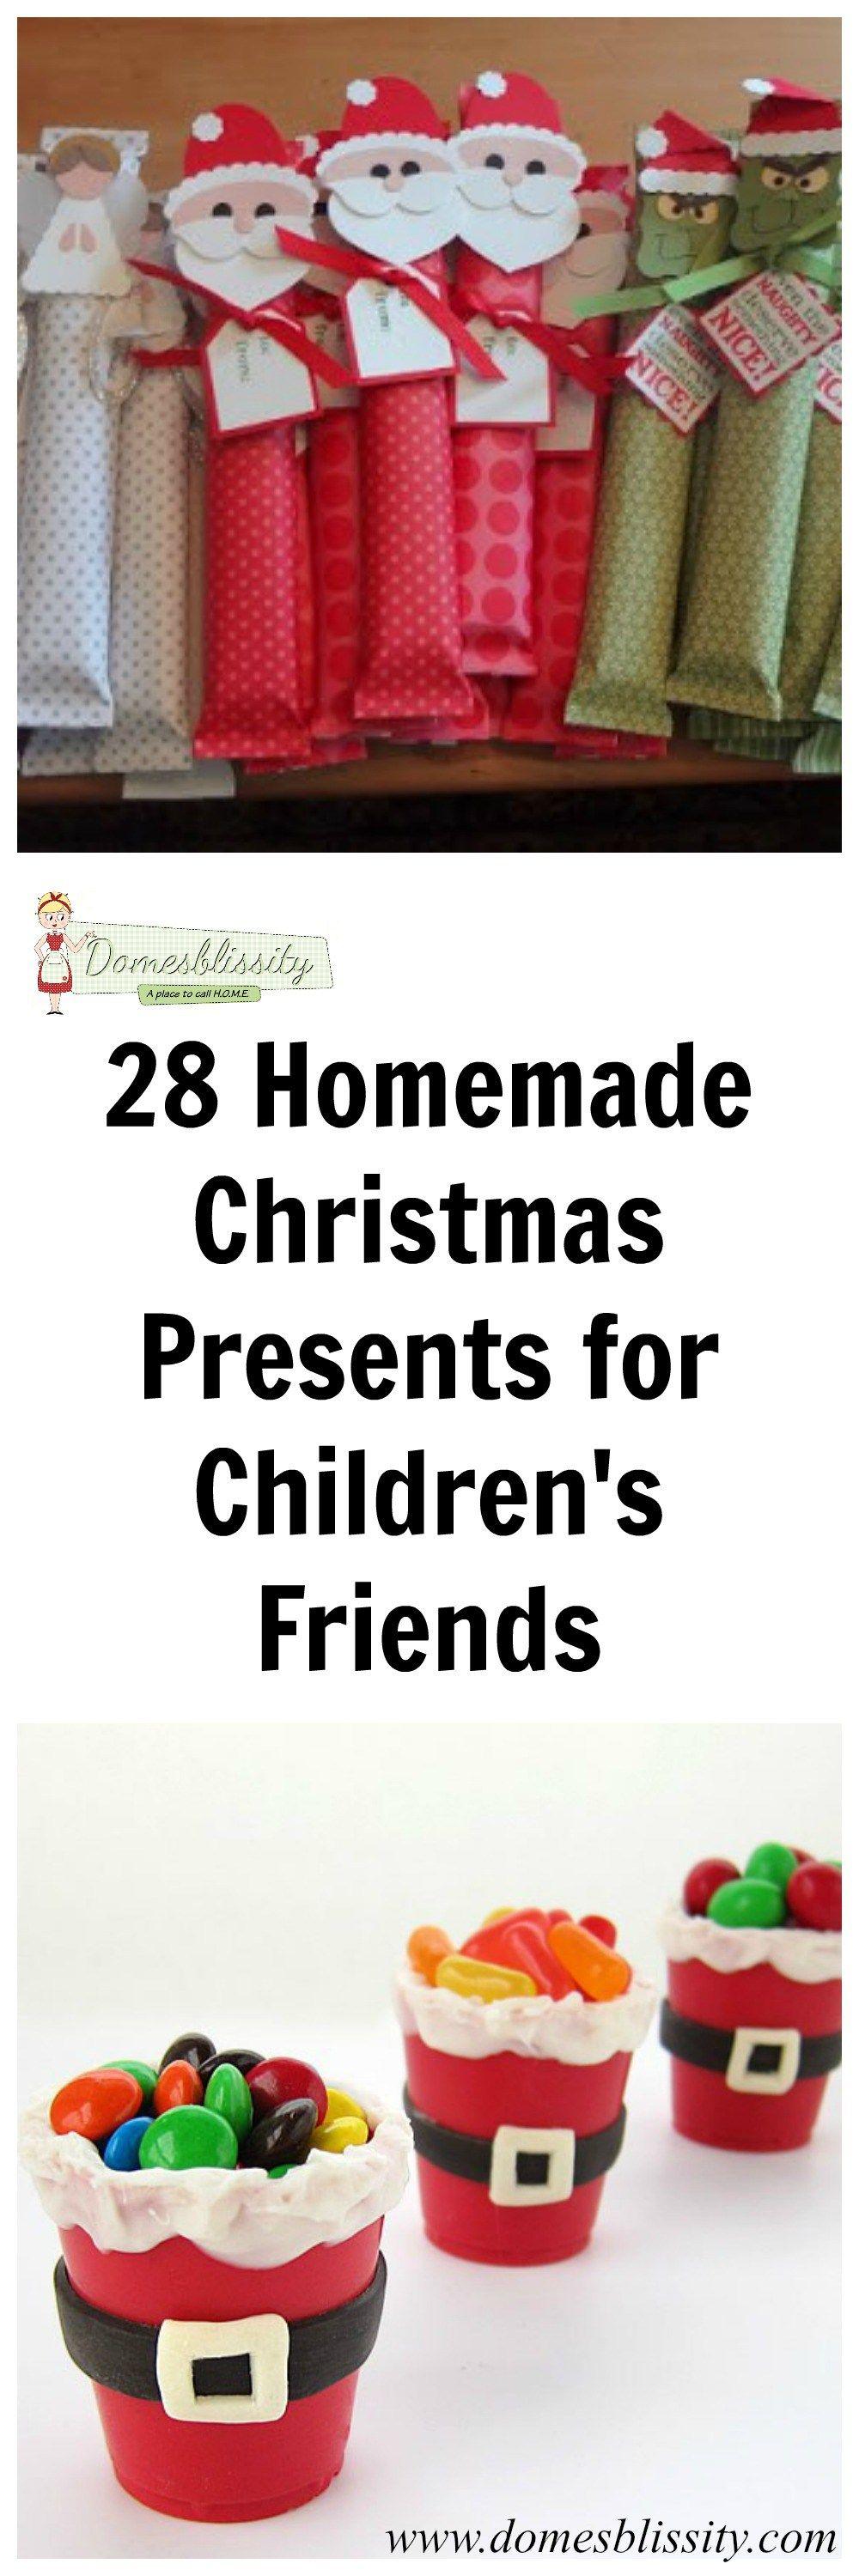 28 homemade Christmas presents for children s friends